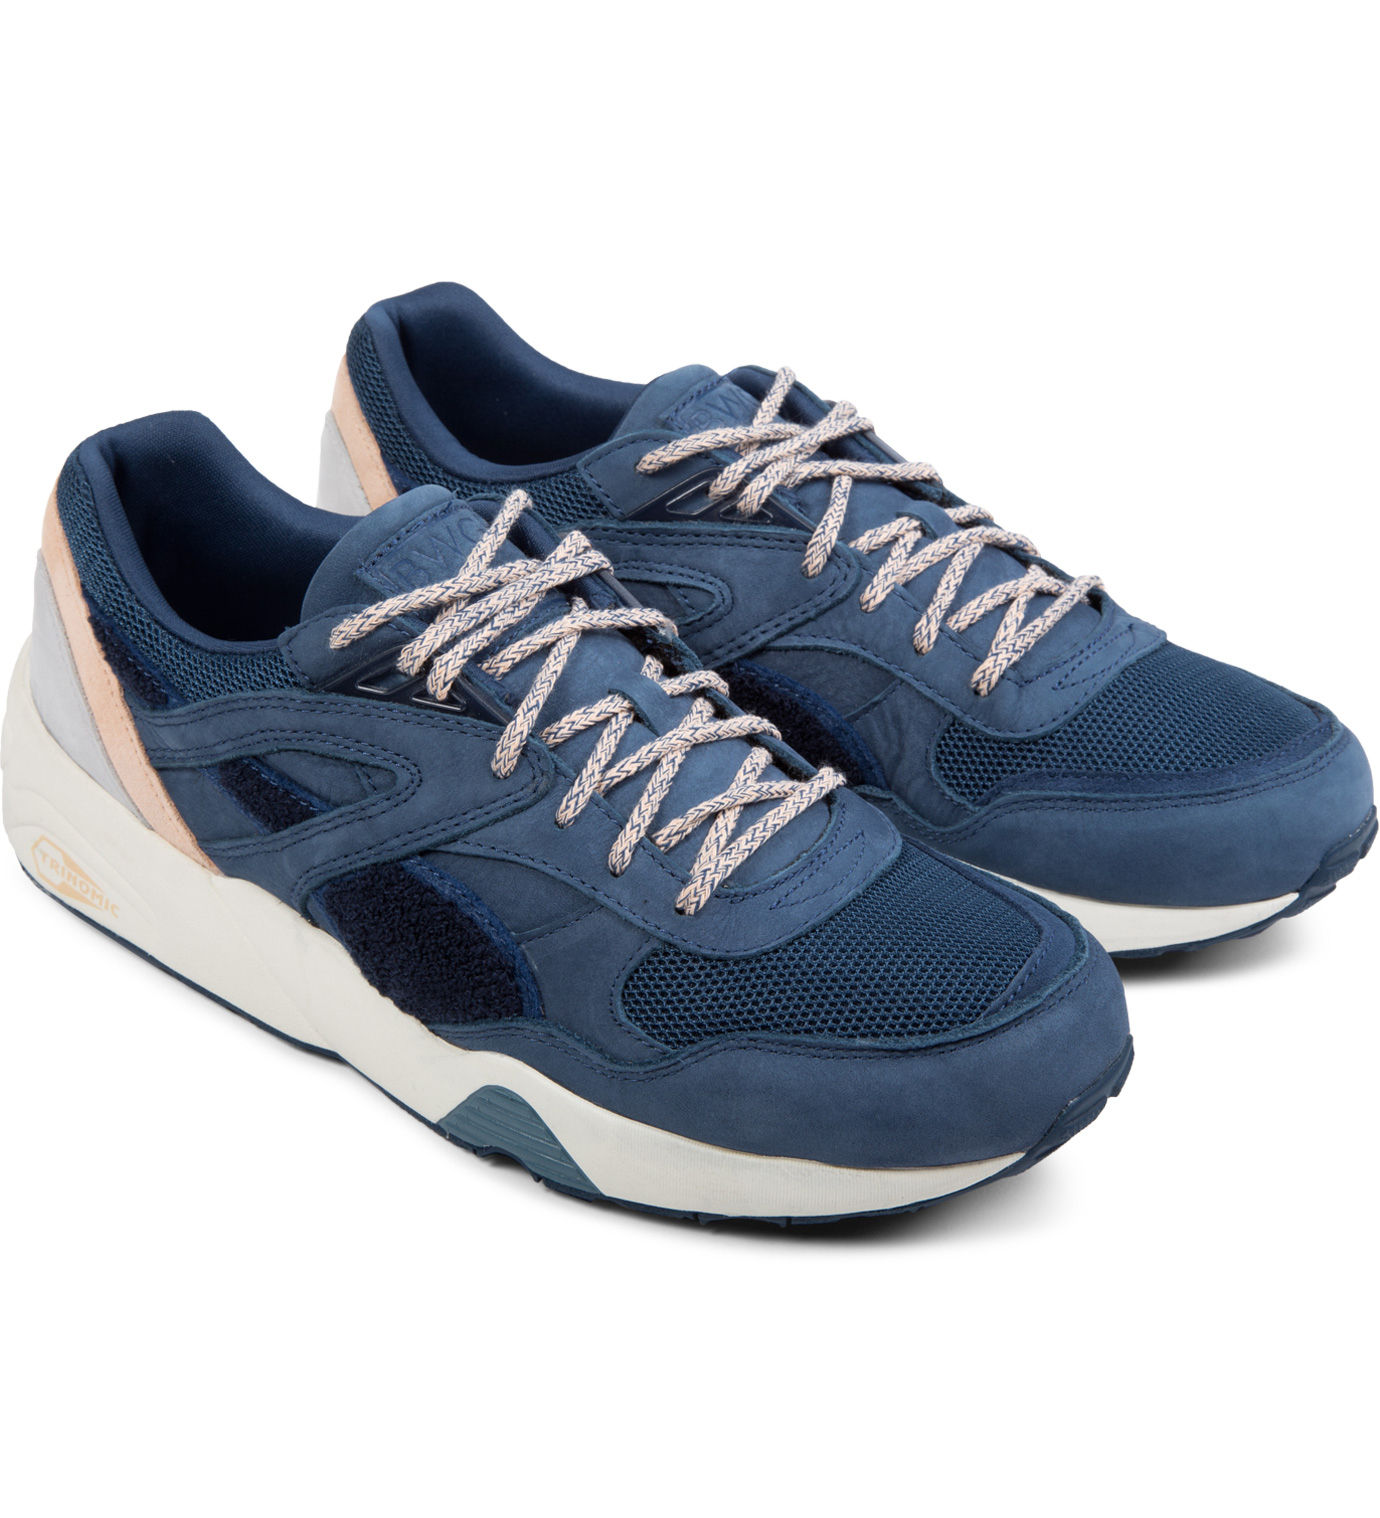 New Balance Denim Shoes